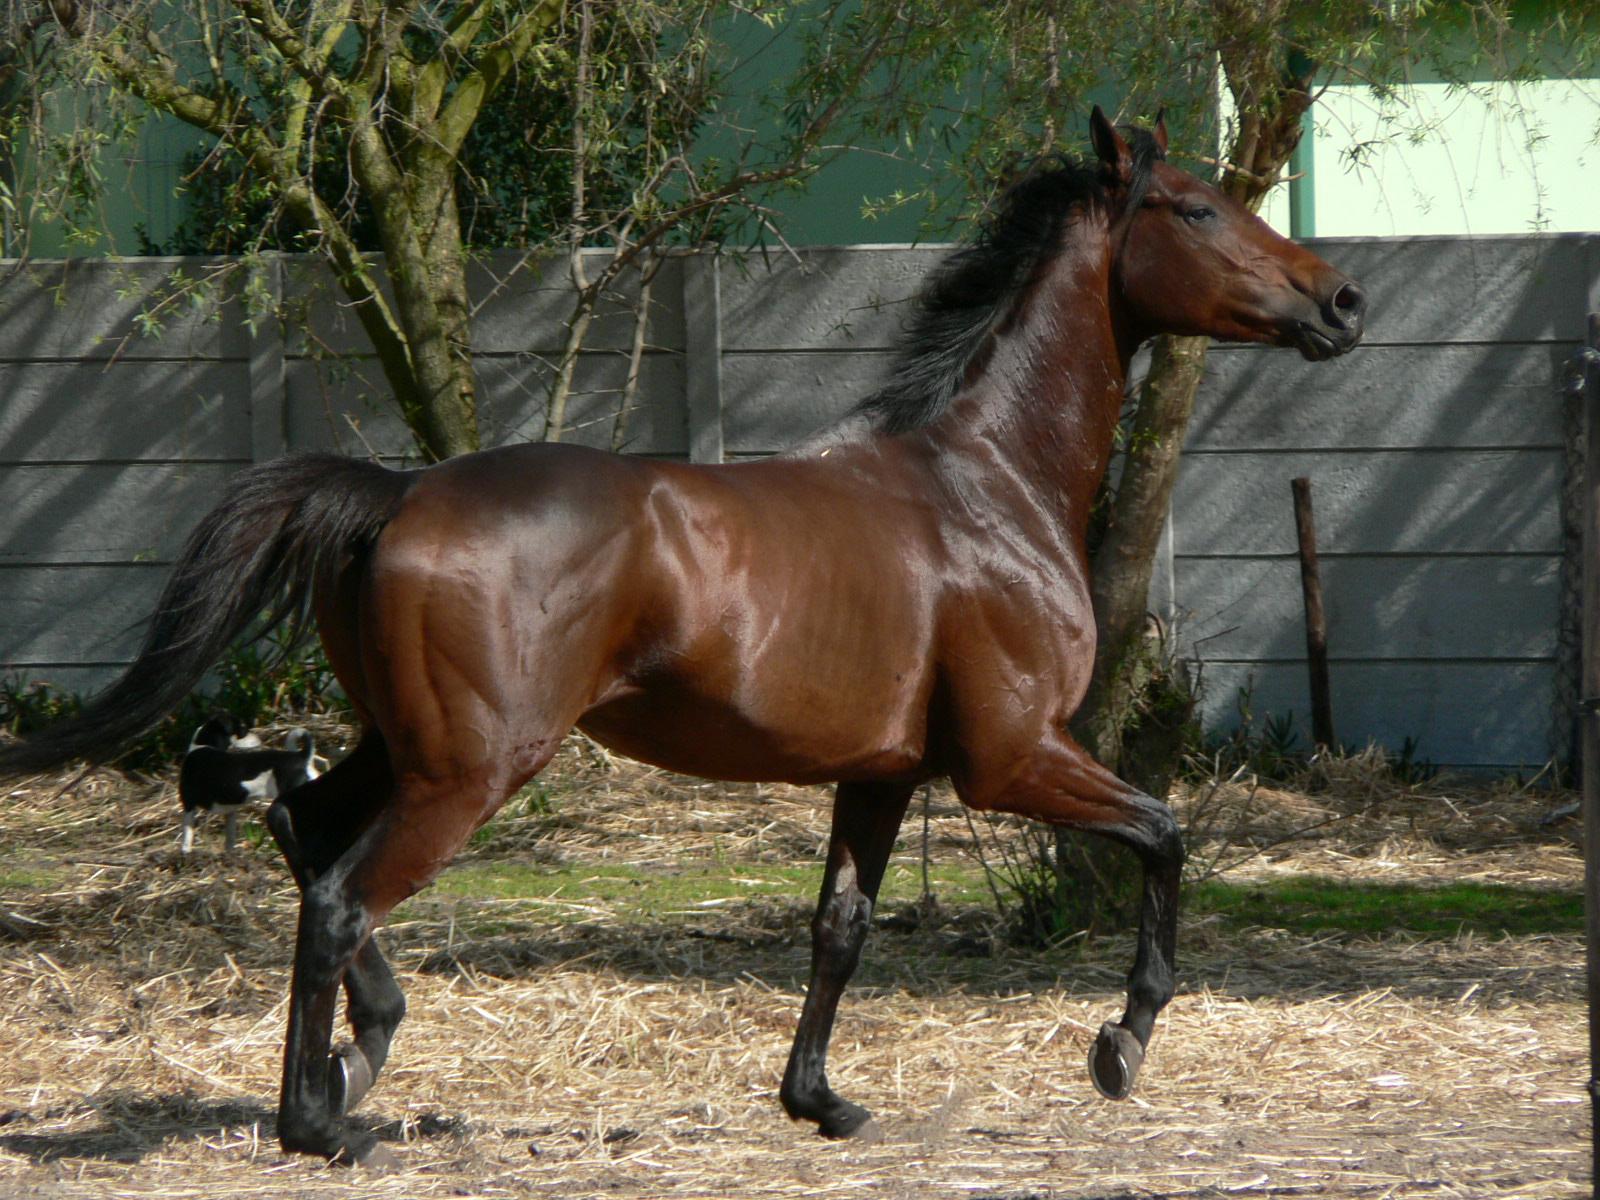 Must see   Wallpaper Horse Deviantart - Thoroughbreds+wallpapers+9  Image_312933.jpg